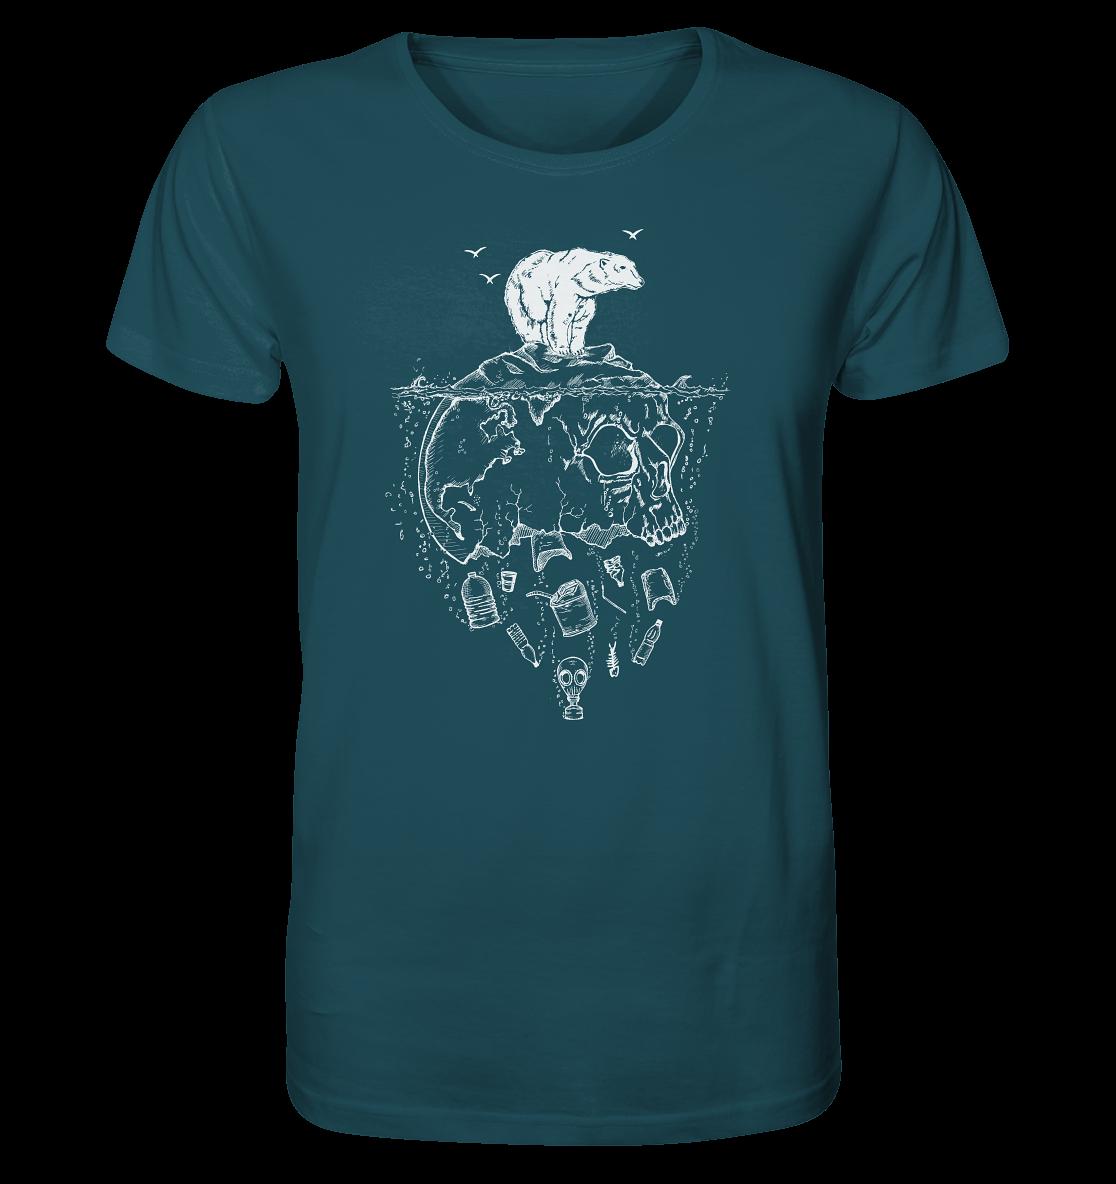 front-organic-shirt-204d59-1116x-5.png